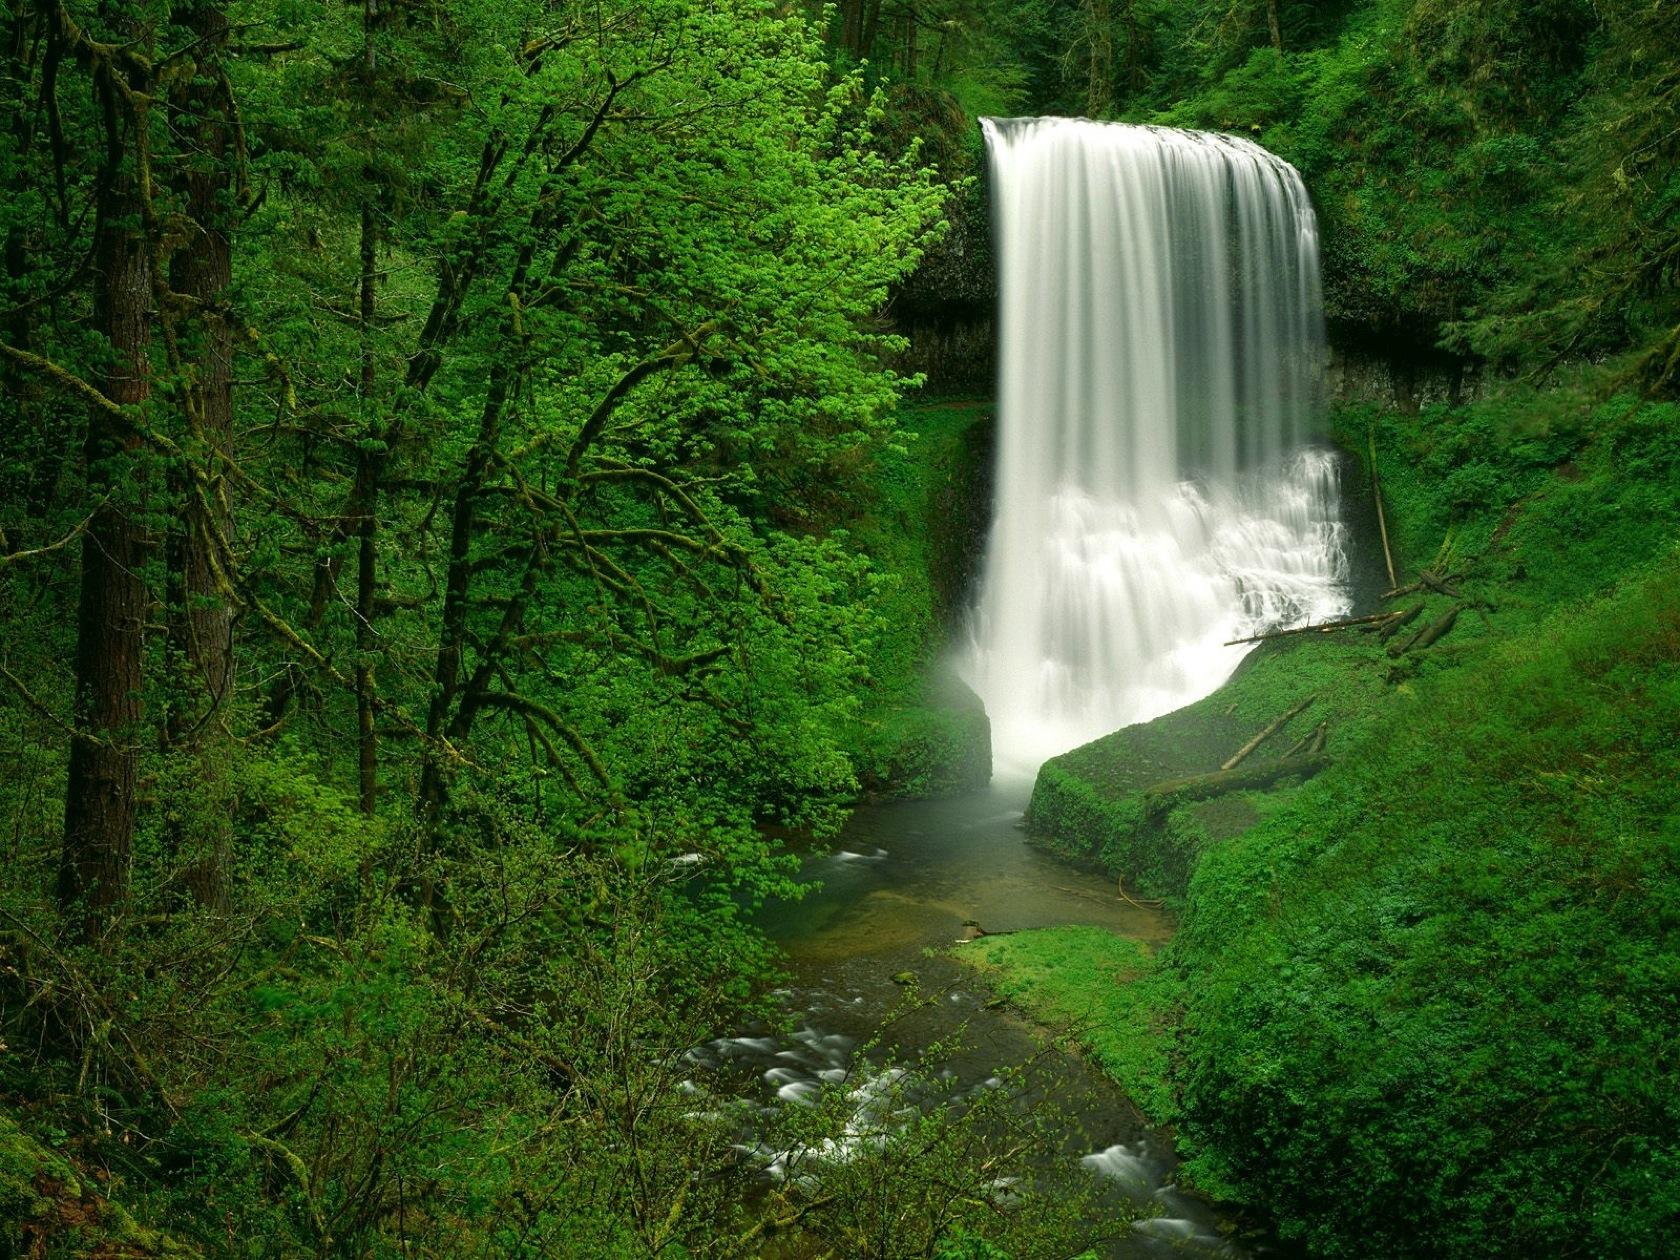 waterfall live wallpaper download 1680x1260